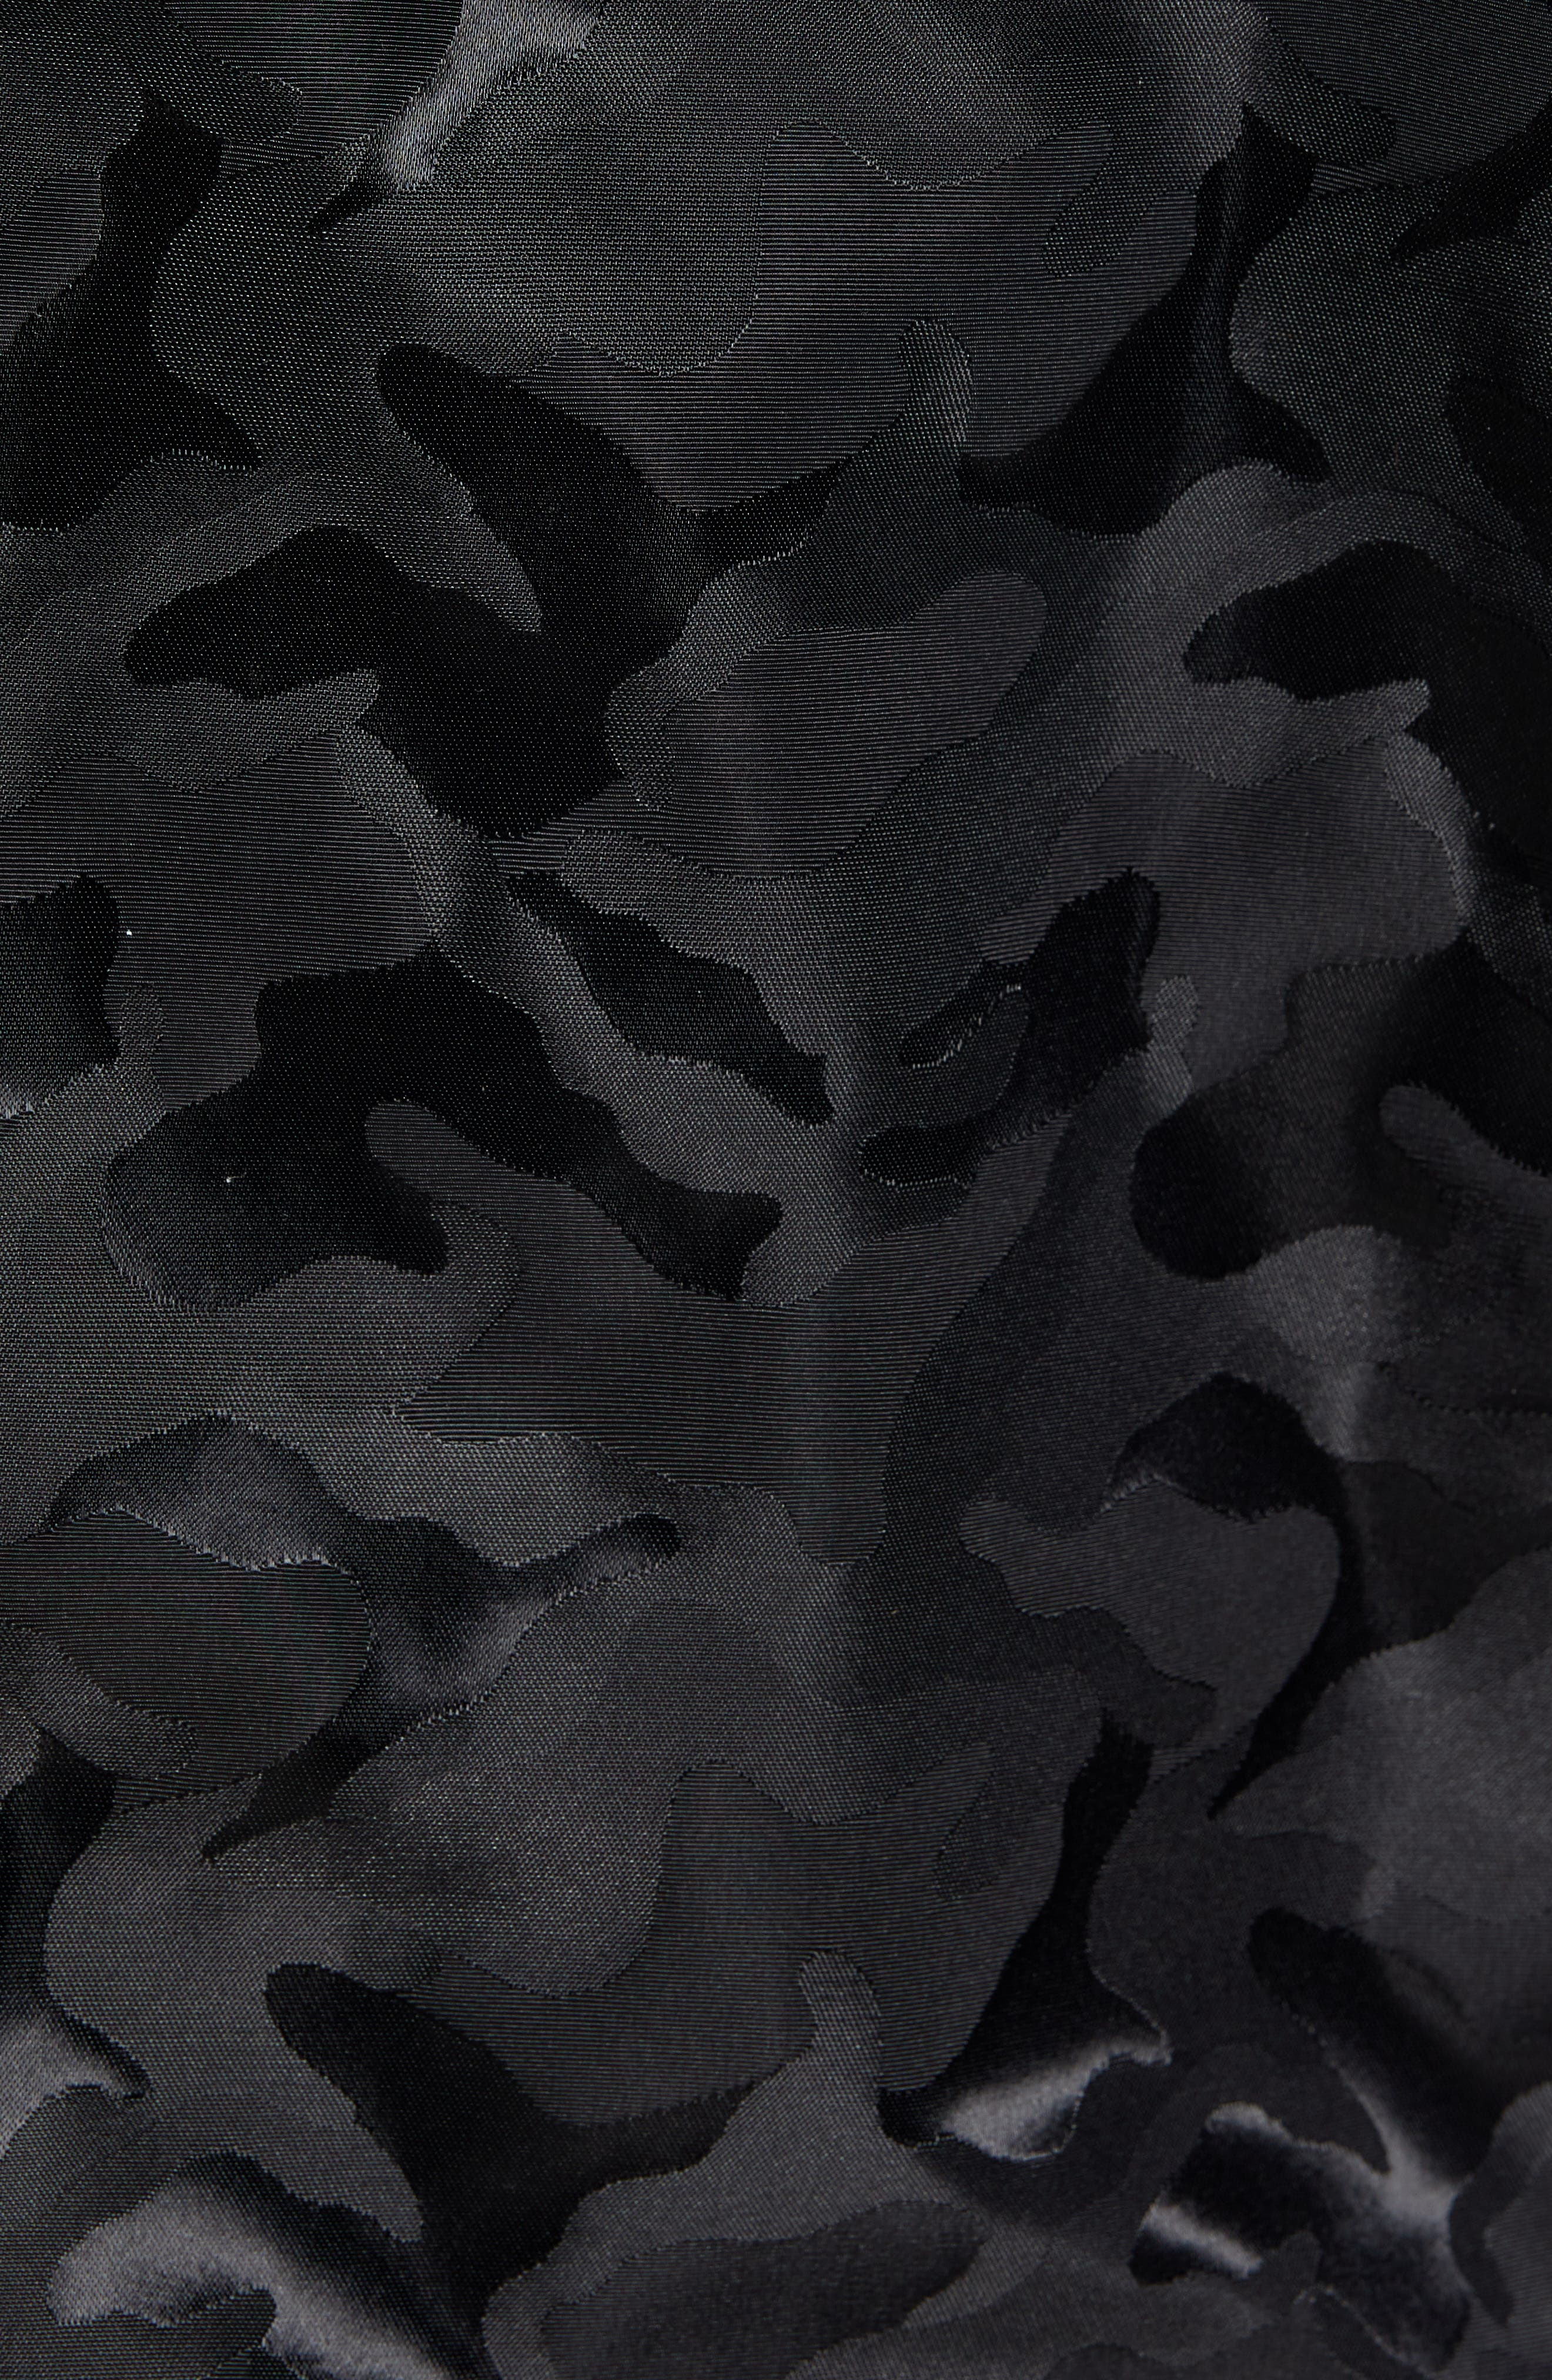 REIGNING CHAMP, Satin Camo Print Stadium Jacket, Alternate thumbnail 7, color, 001